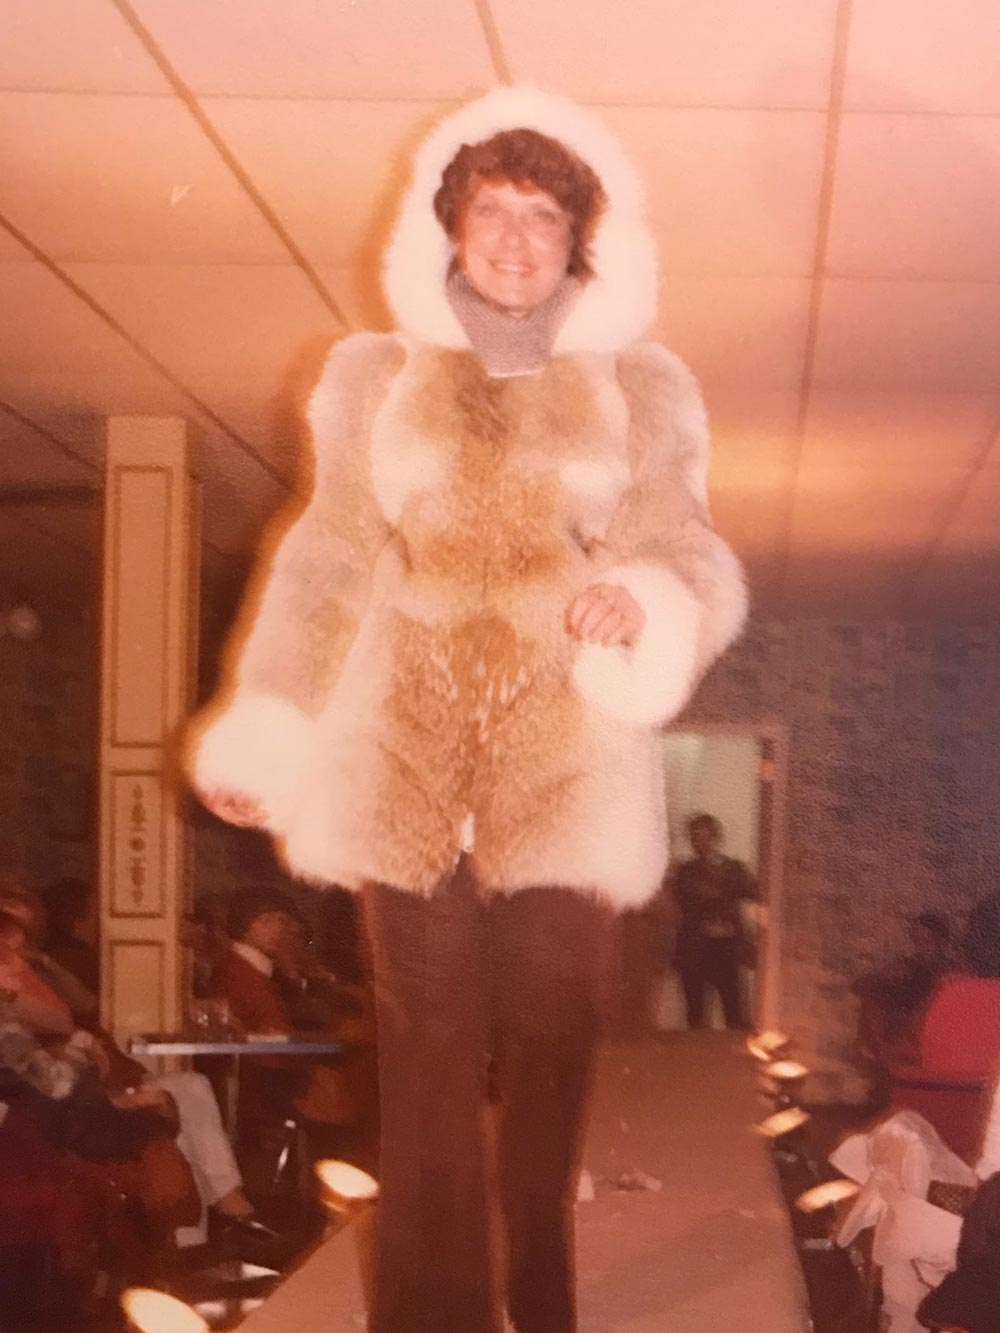 Manteau de fourrure blanc vintage - Fourrure Abitibi360